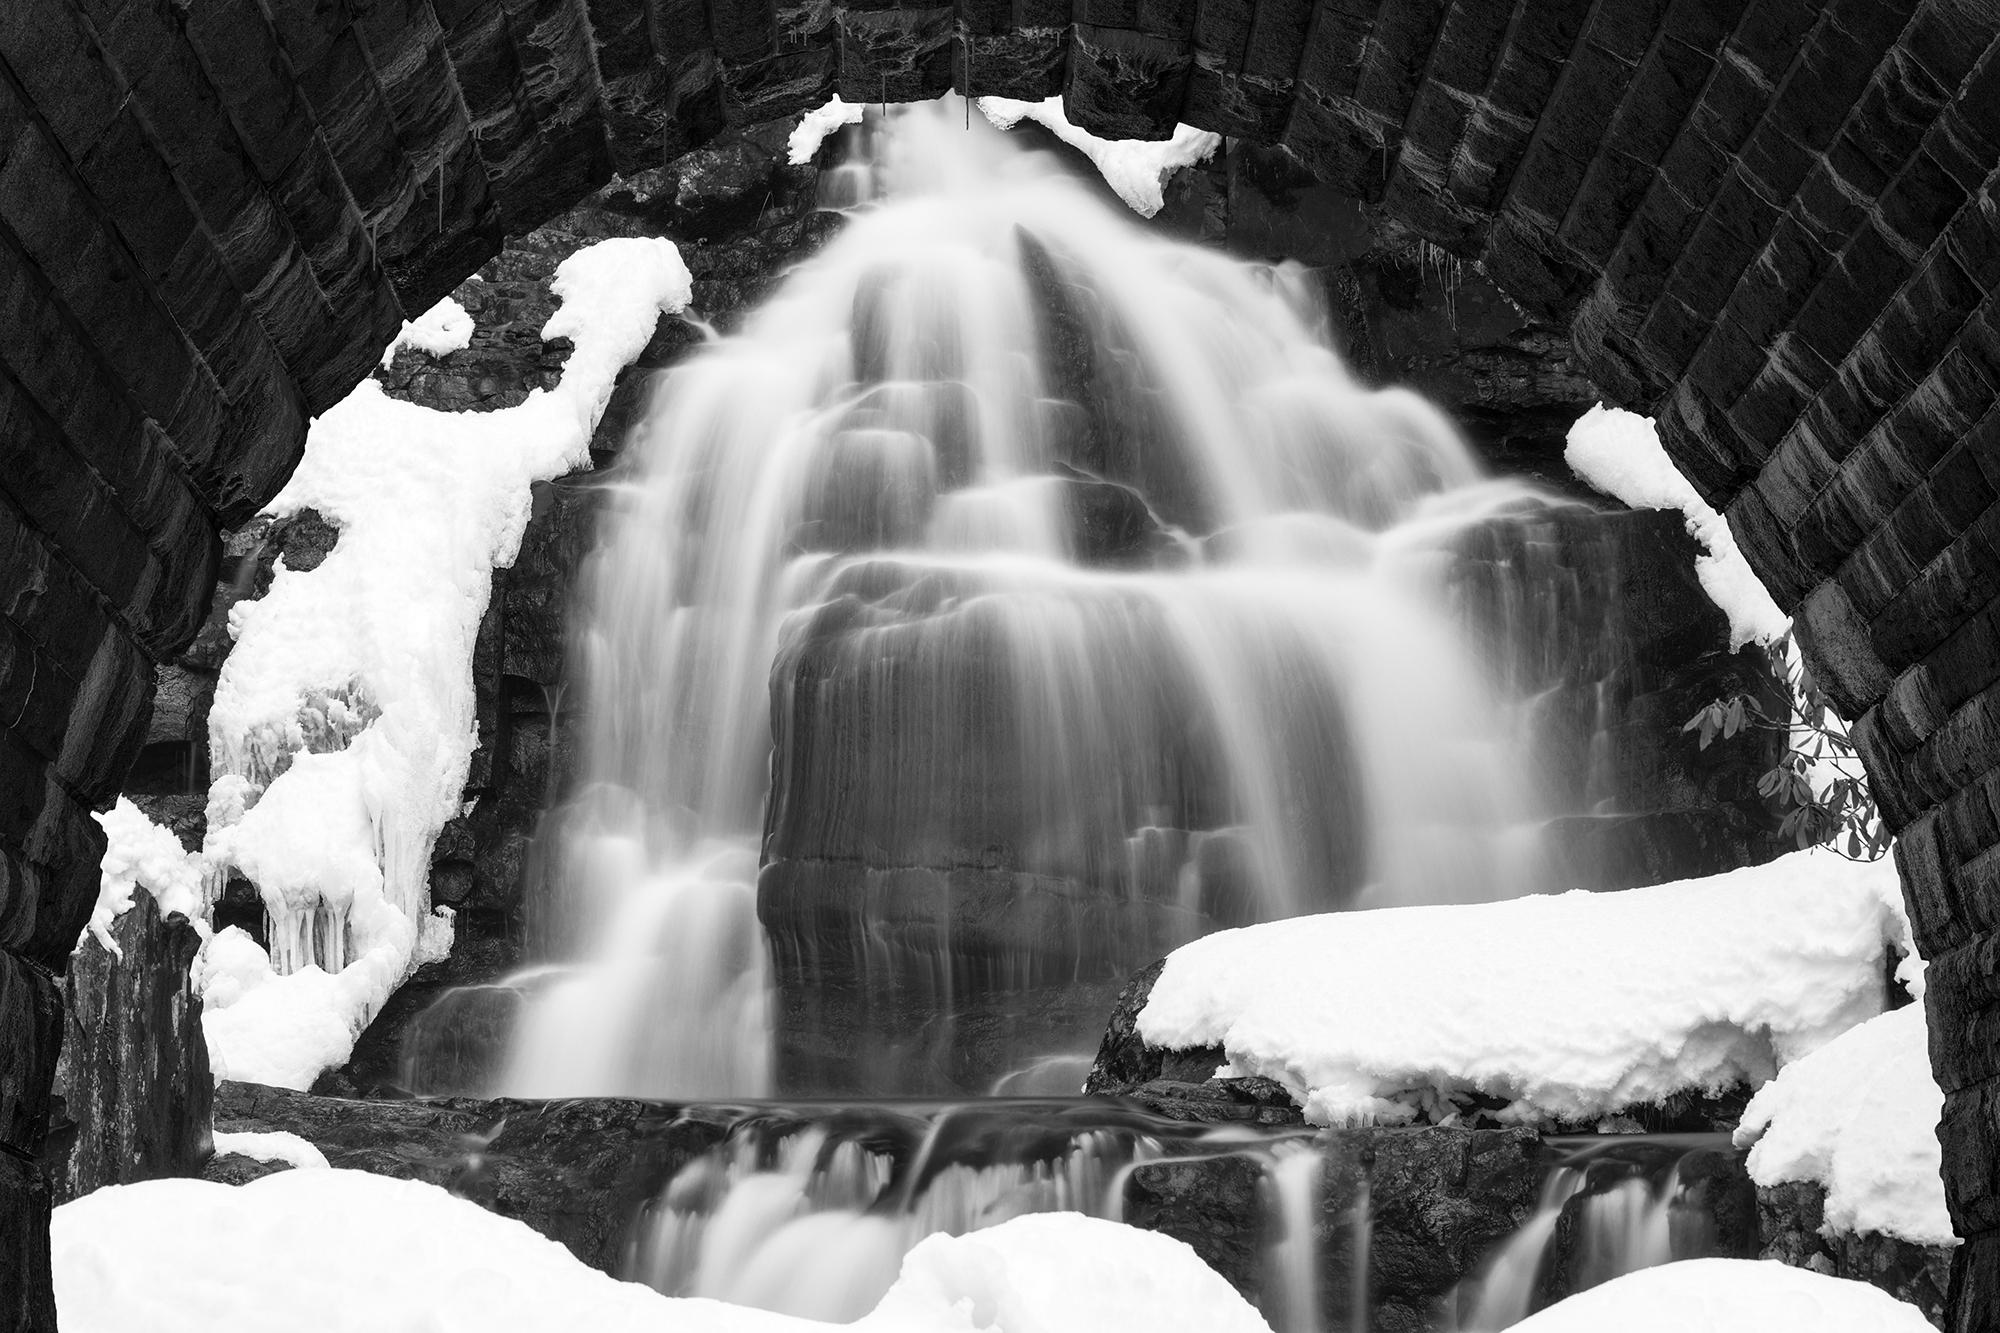 20496938-NicolasRaymond_WinterArchWaterfall_Photography_24x16_400.jpg